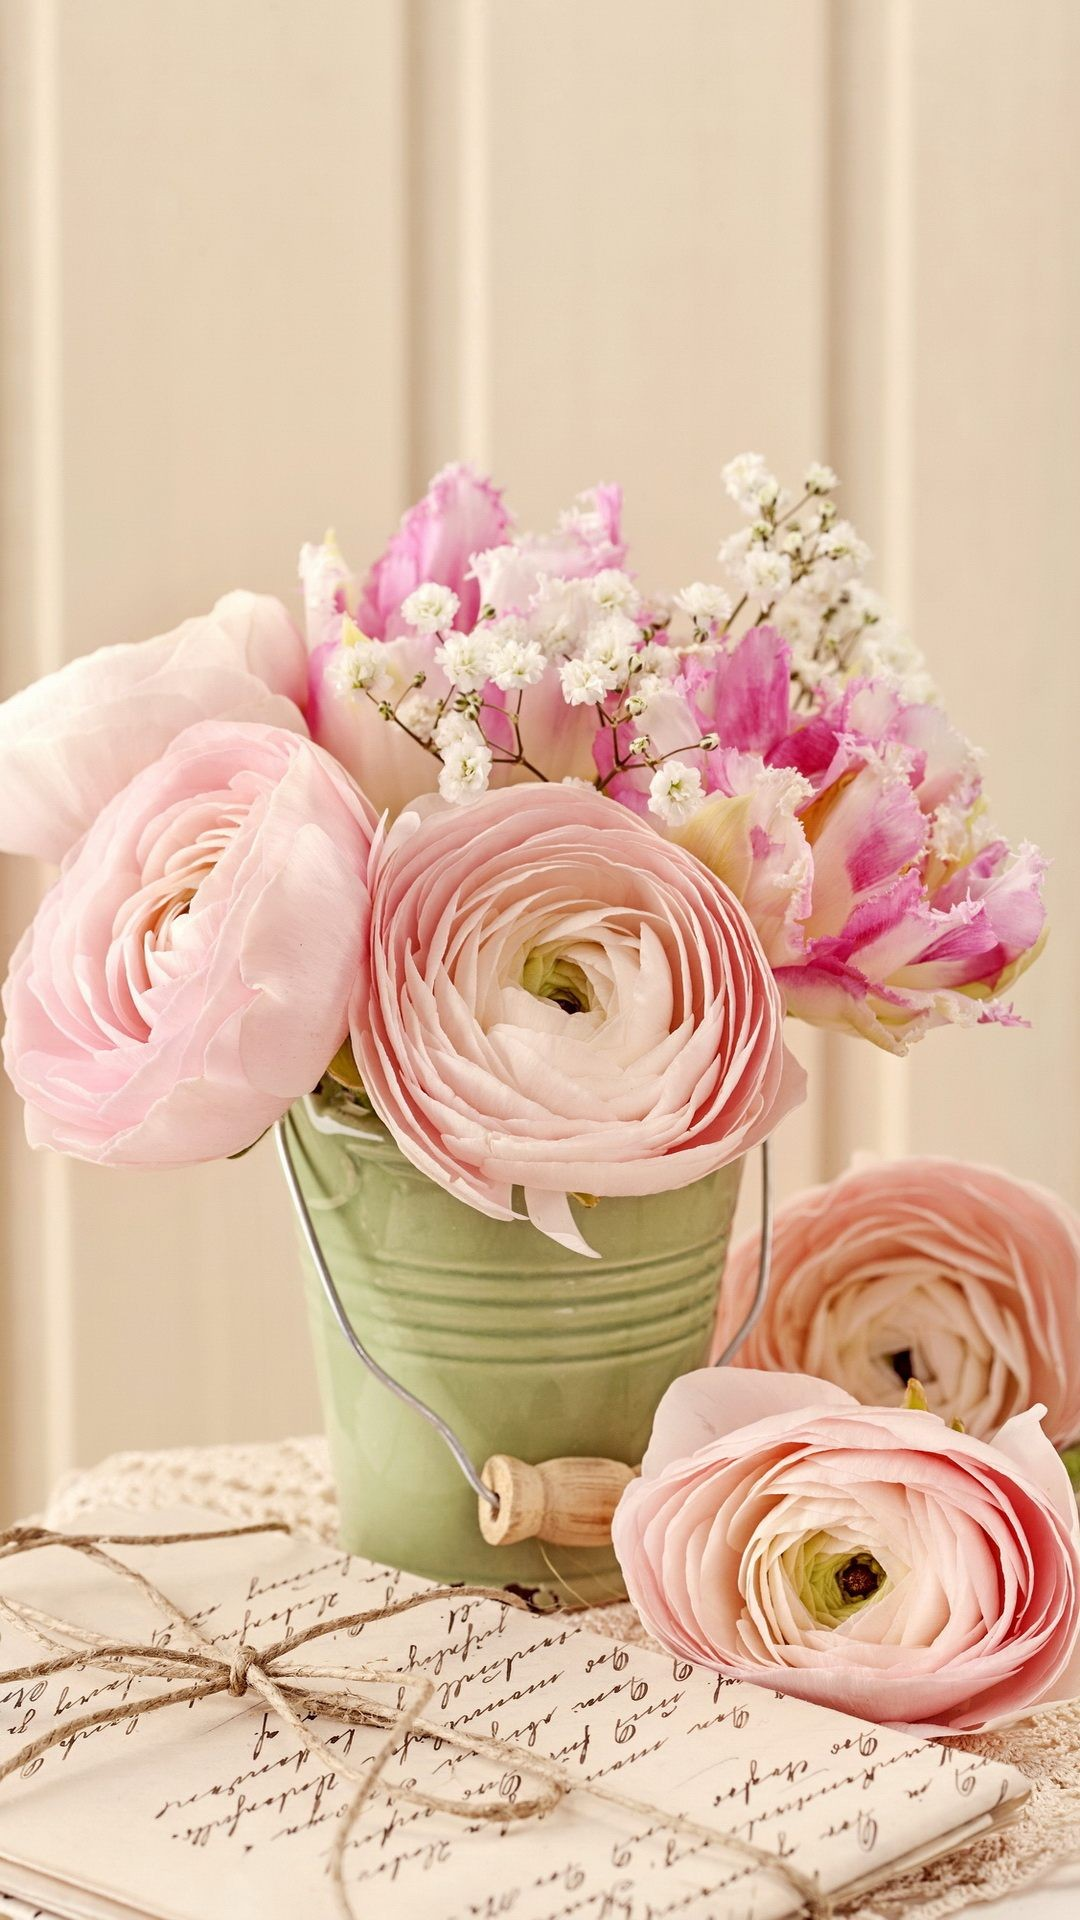 Free download Love Vintage Roses iPhone 6 Plus Wallpapers ...